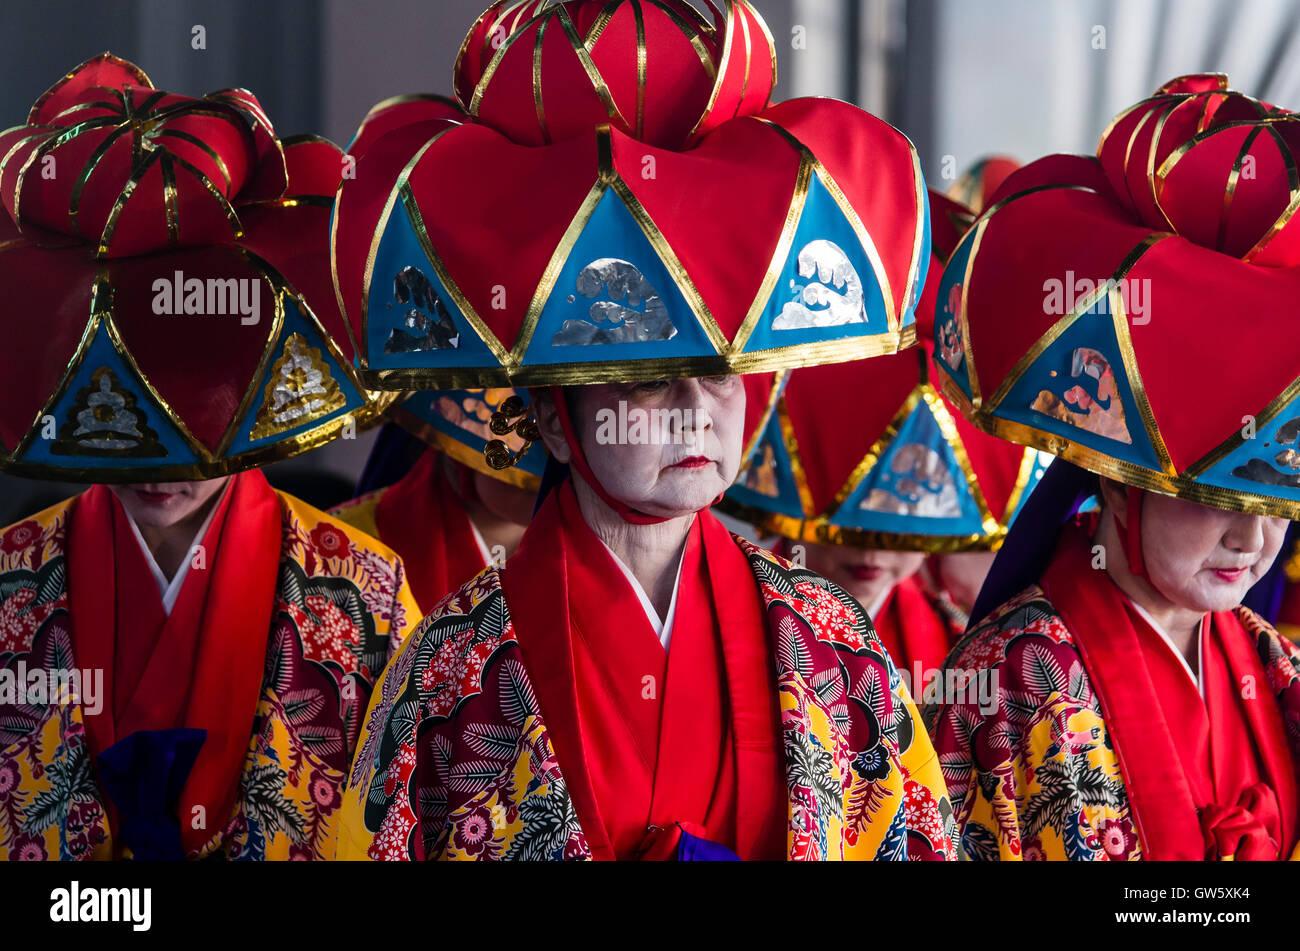 Japanese dancers, Okinawa folklore. - Stock Image